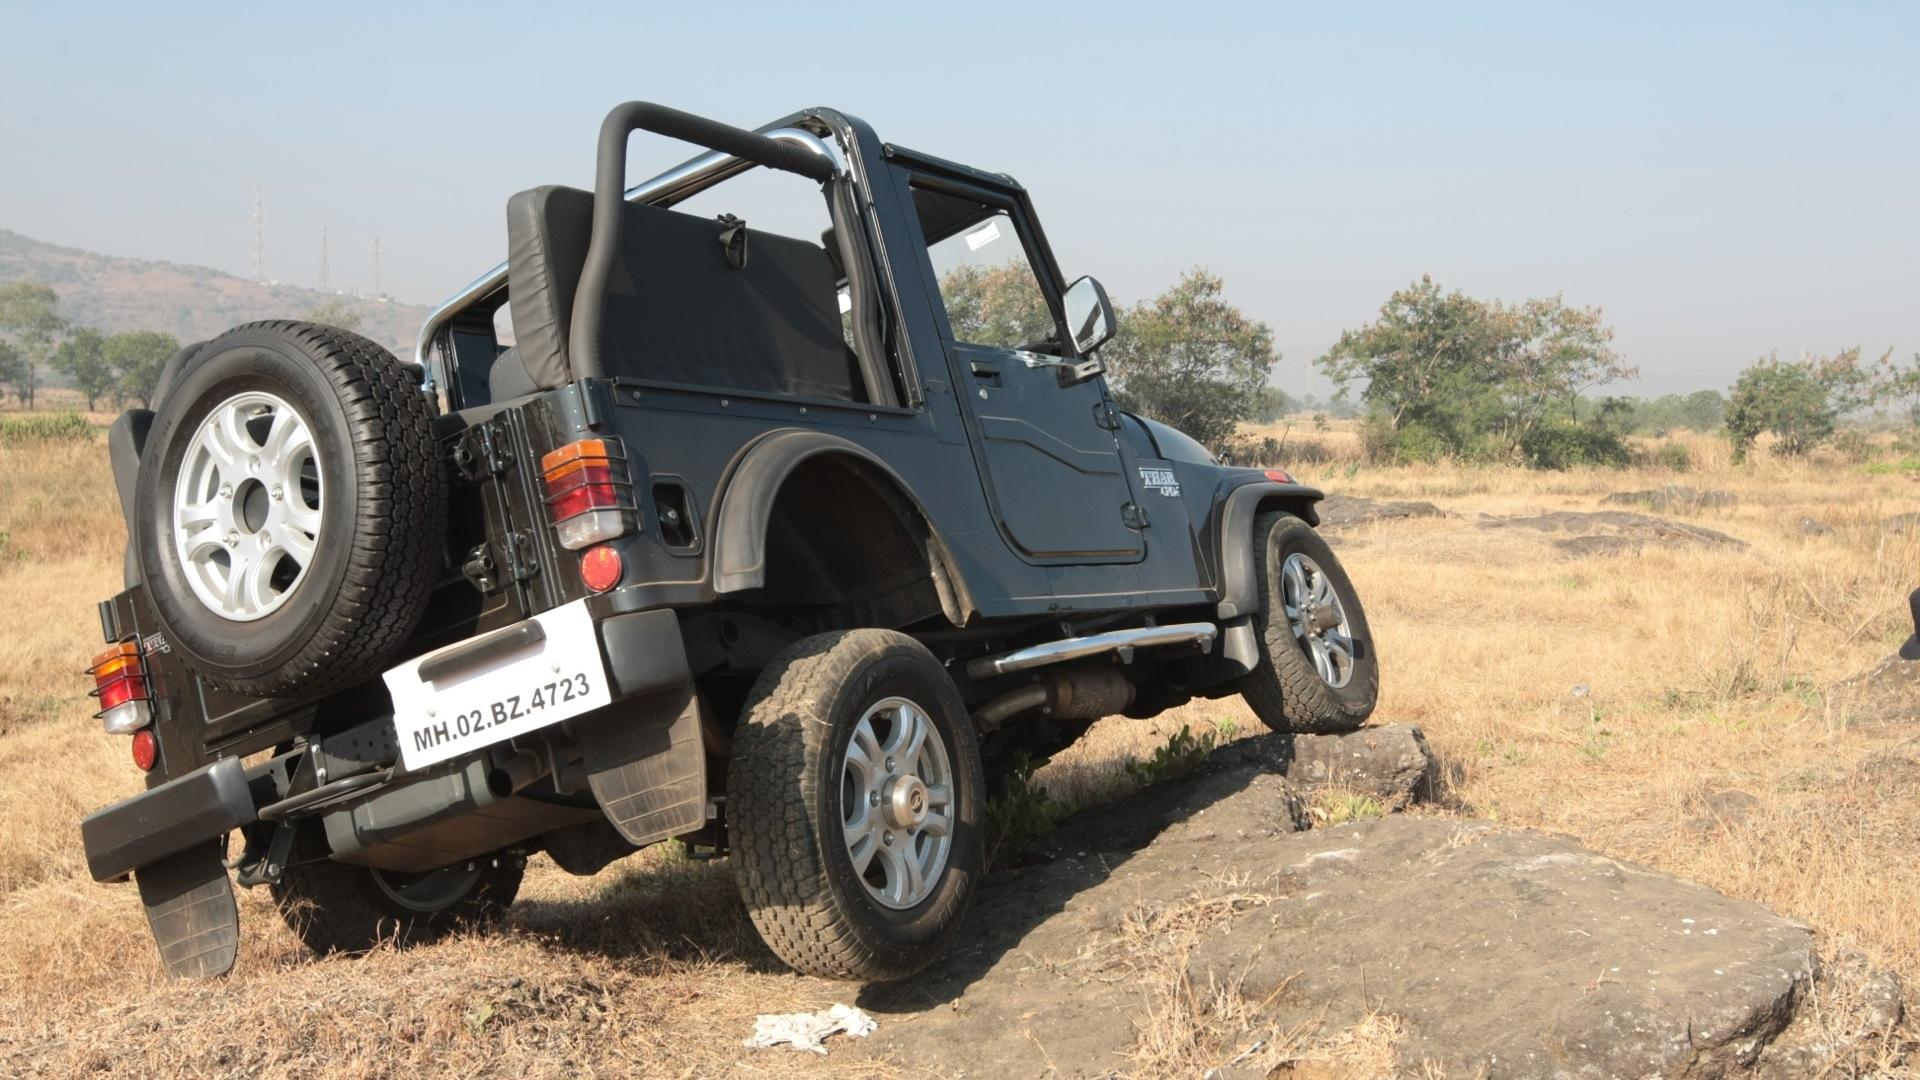 Mahindra-Thar-2013-CRDe--4x4-Compare